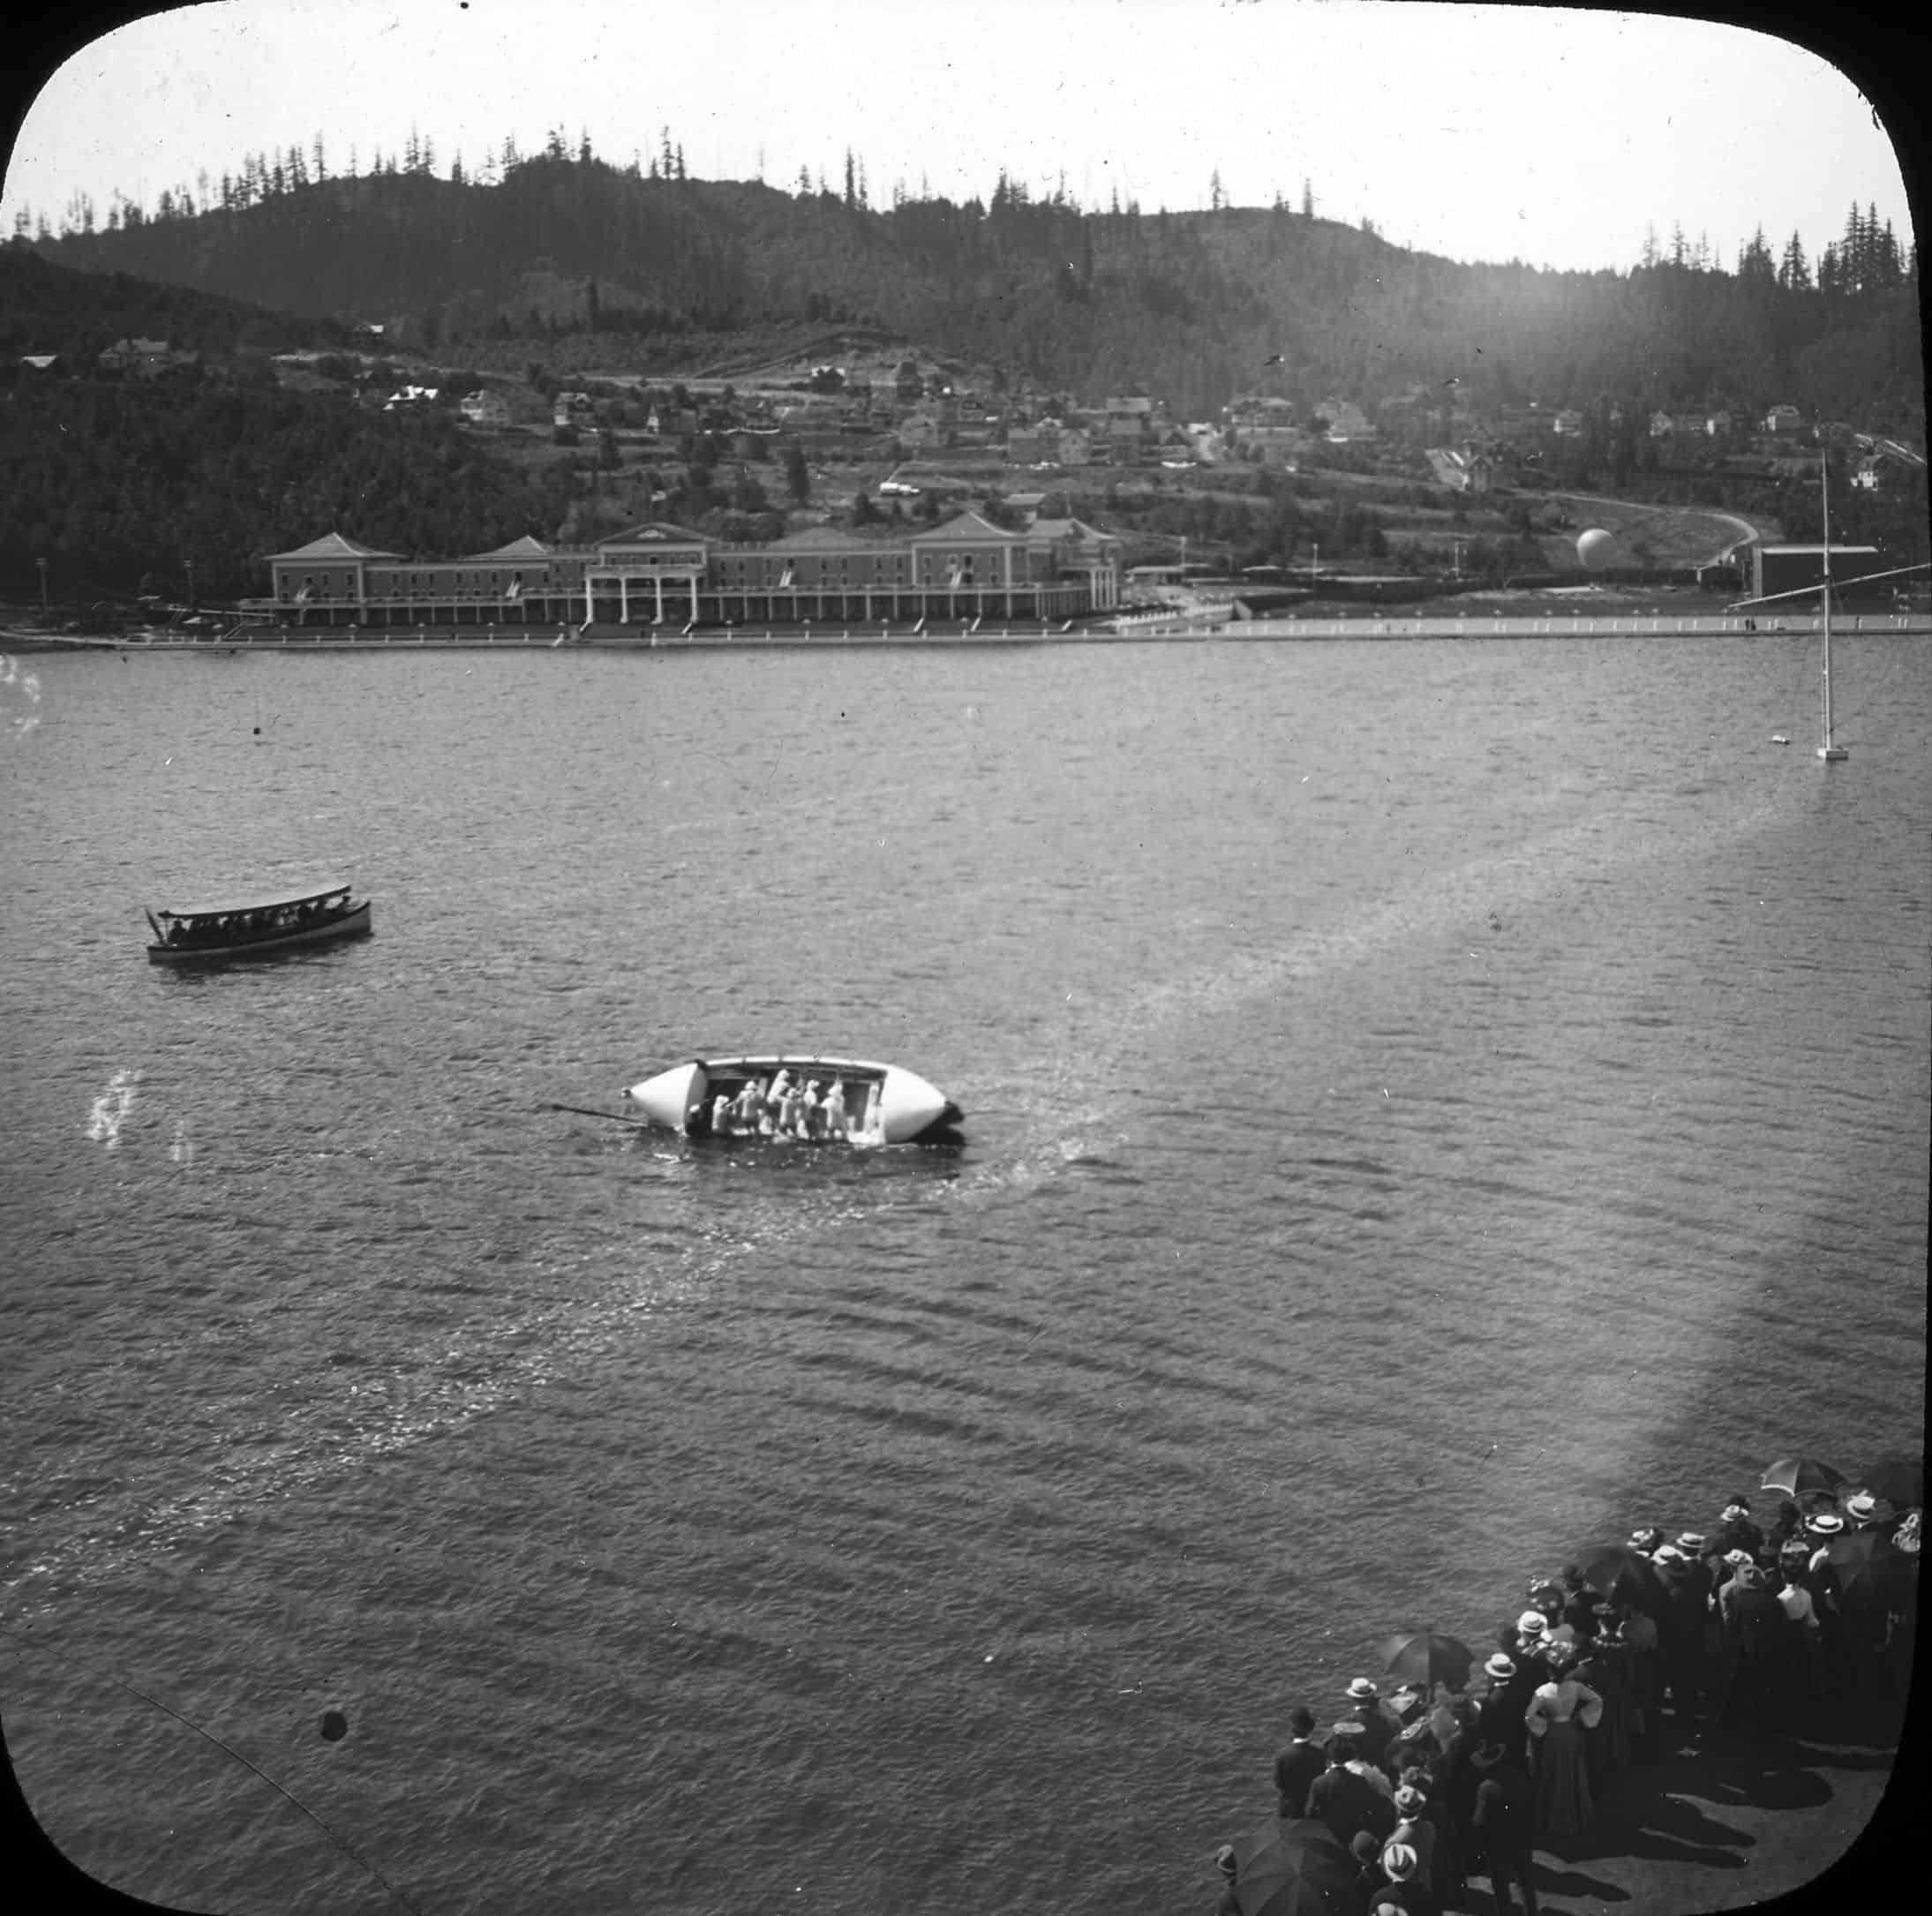 18-Water stunt